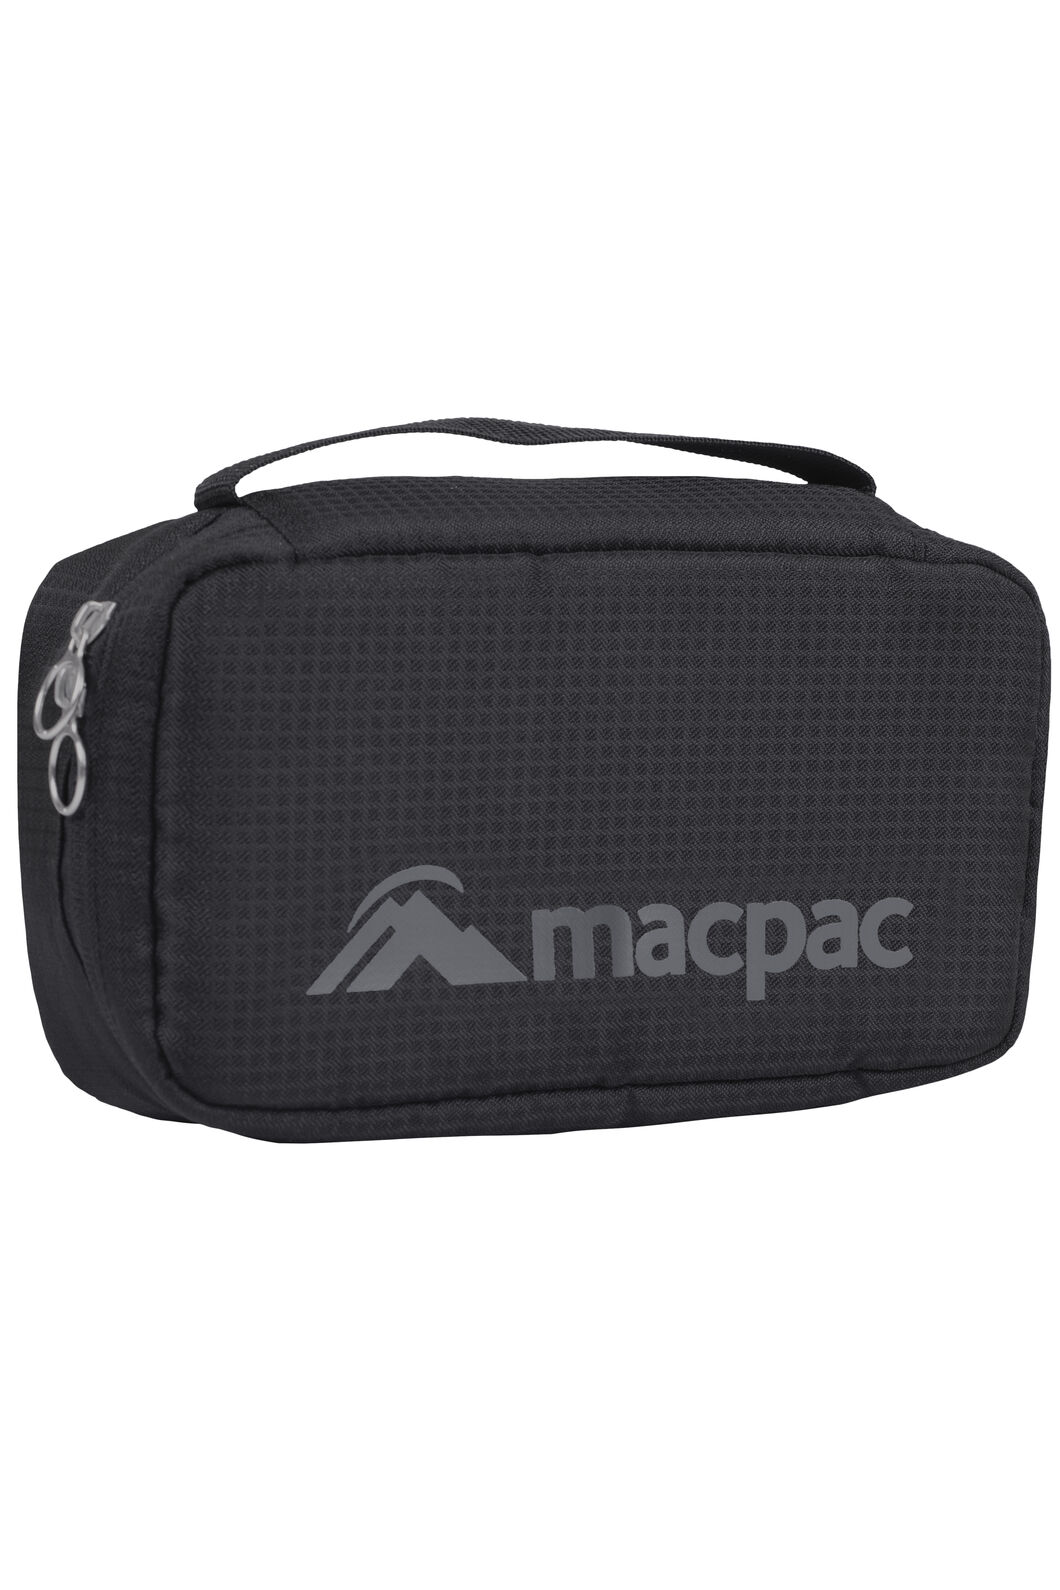 Macpac Utility Case, Black, hi-res